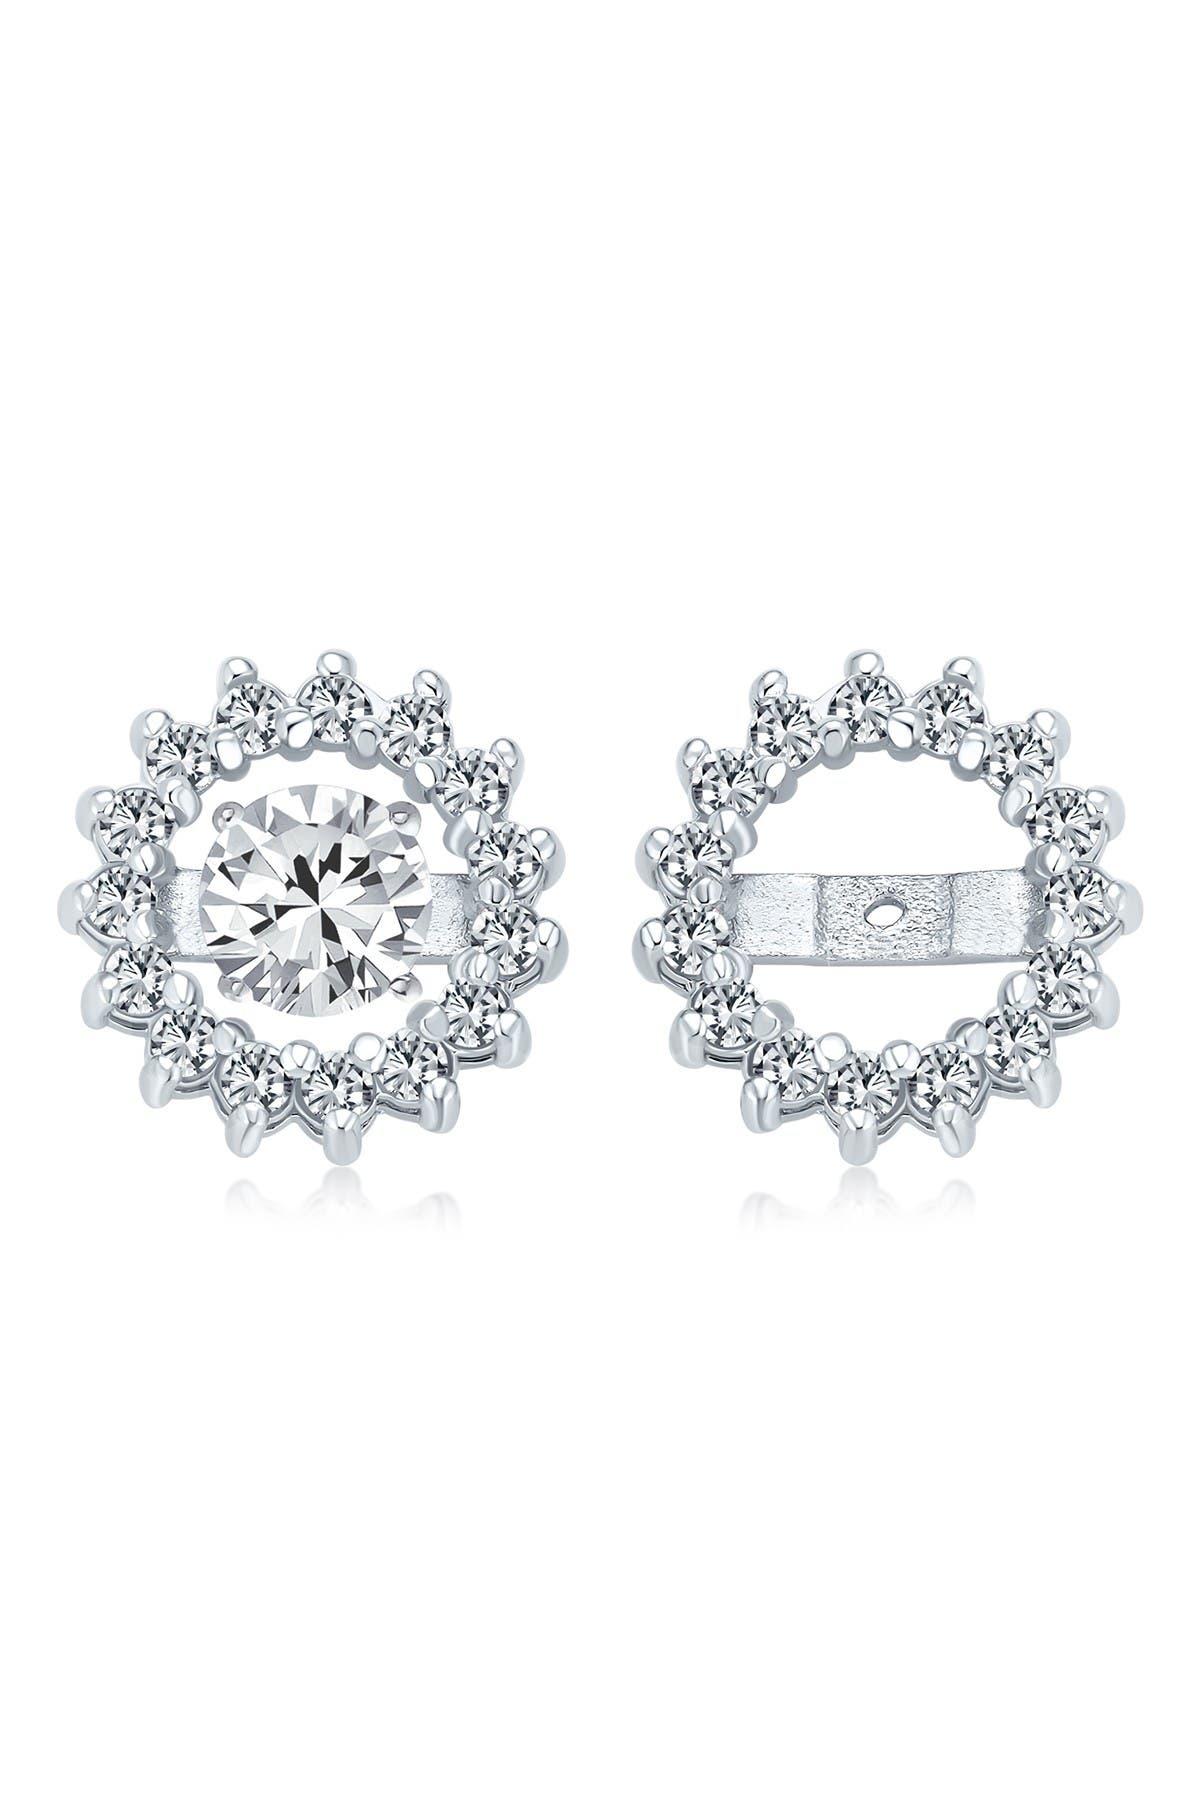 Image of Bling Jewelry CZ Stud & Halo Jacket Earrings